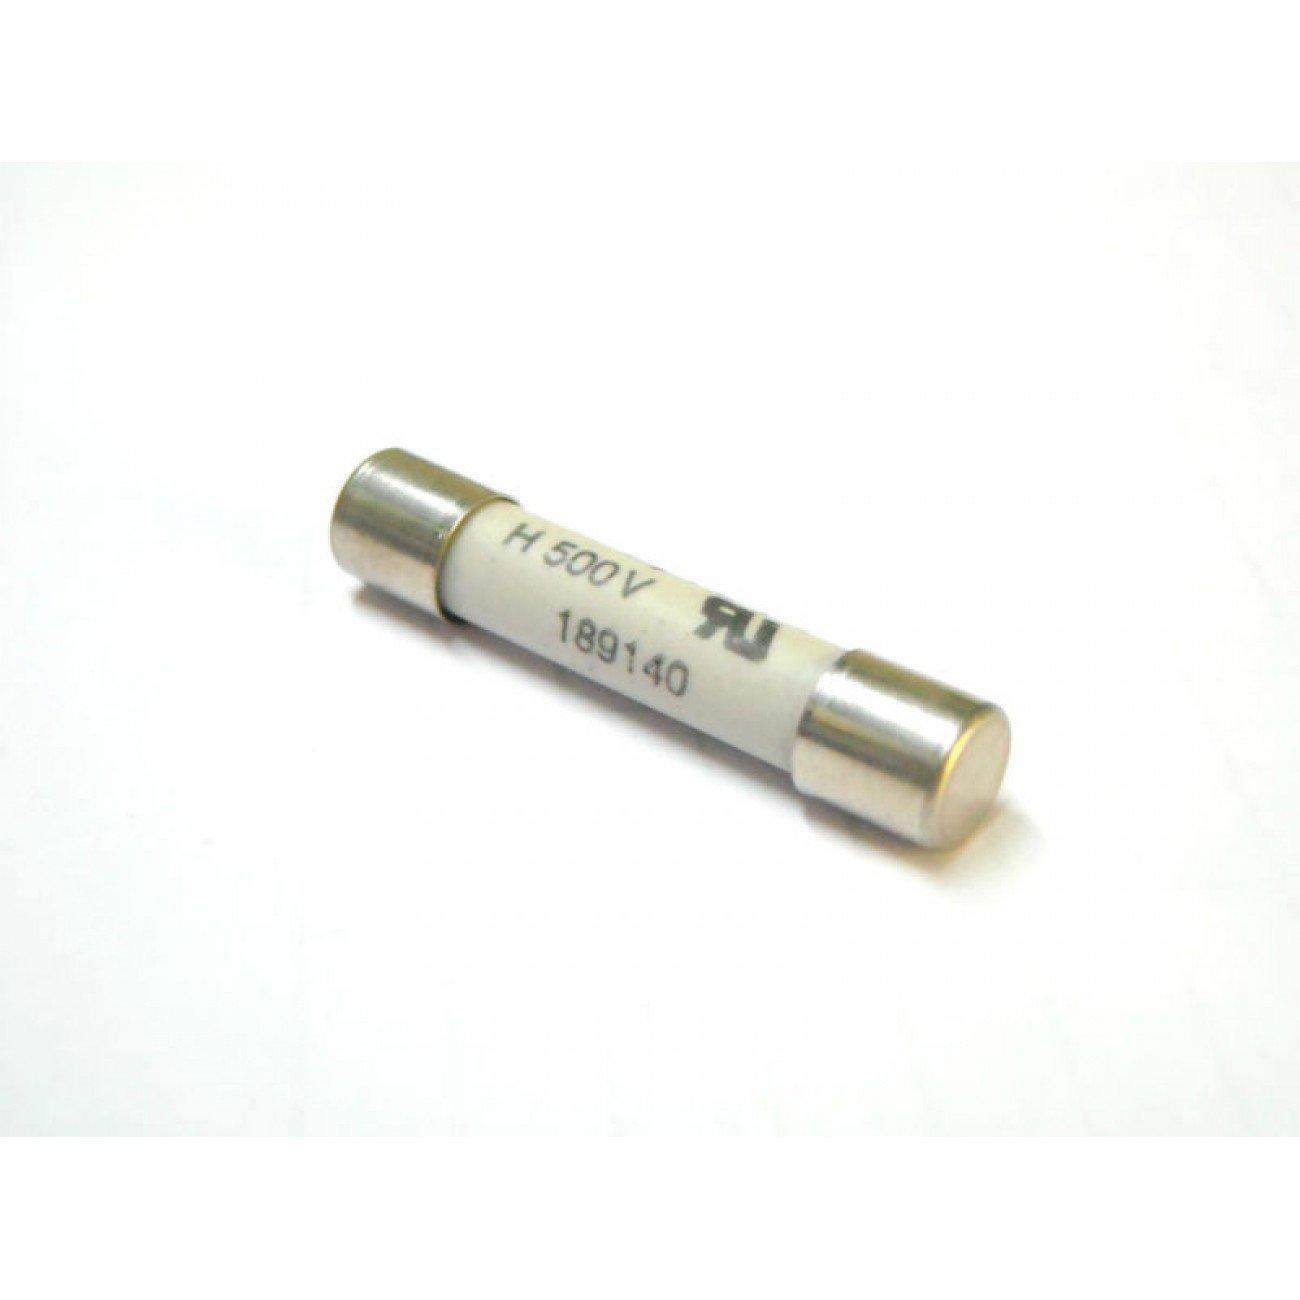 6.3 Amp FAST BLOW 5mm x 20mm 250V GLASS FUSE - F6.3AL250V A Quick